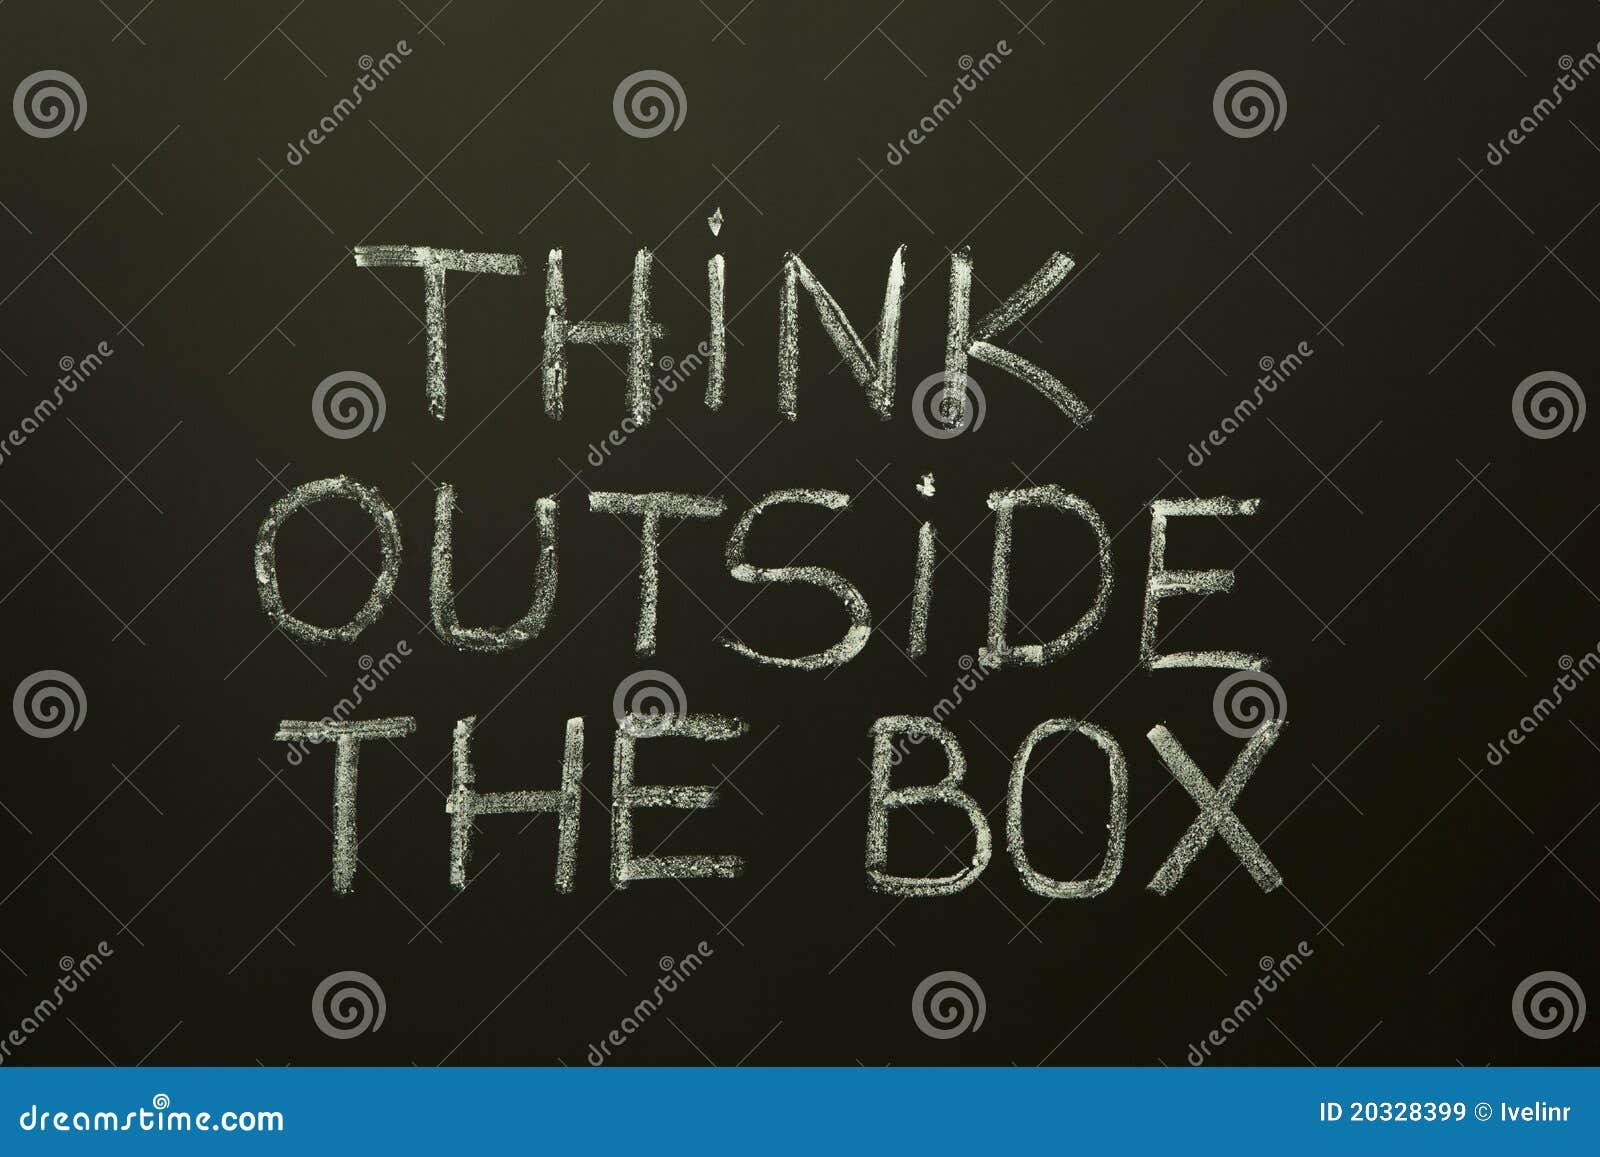 THINK OUTSIDE THE BOX on a blackboard